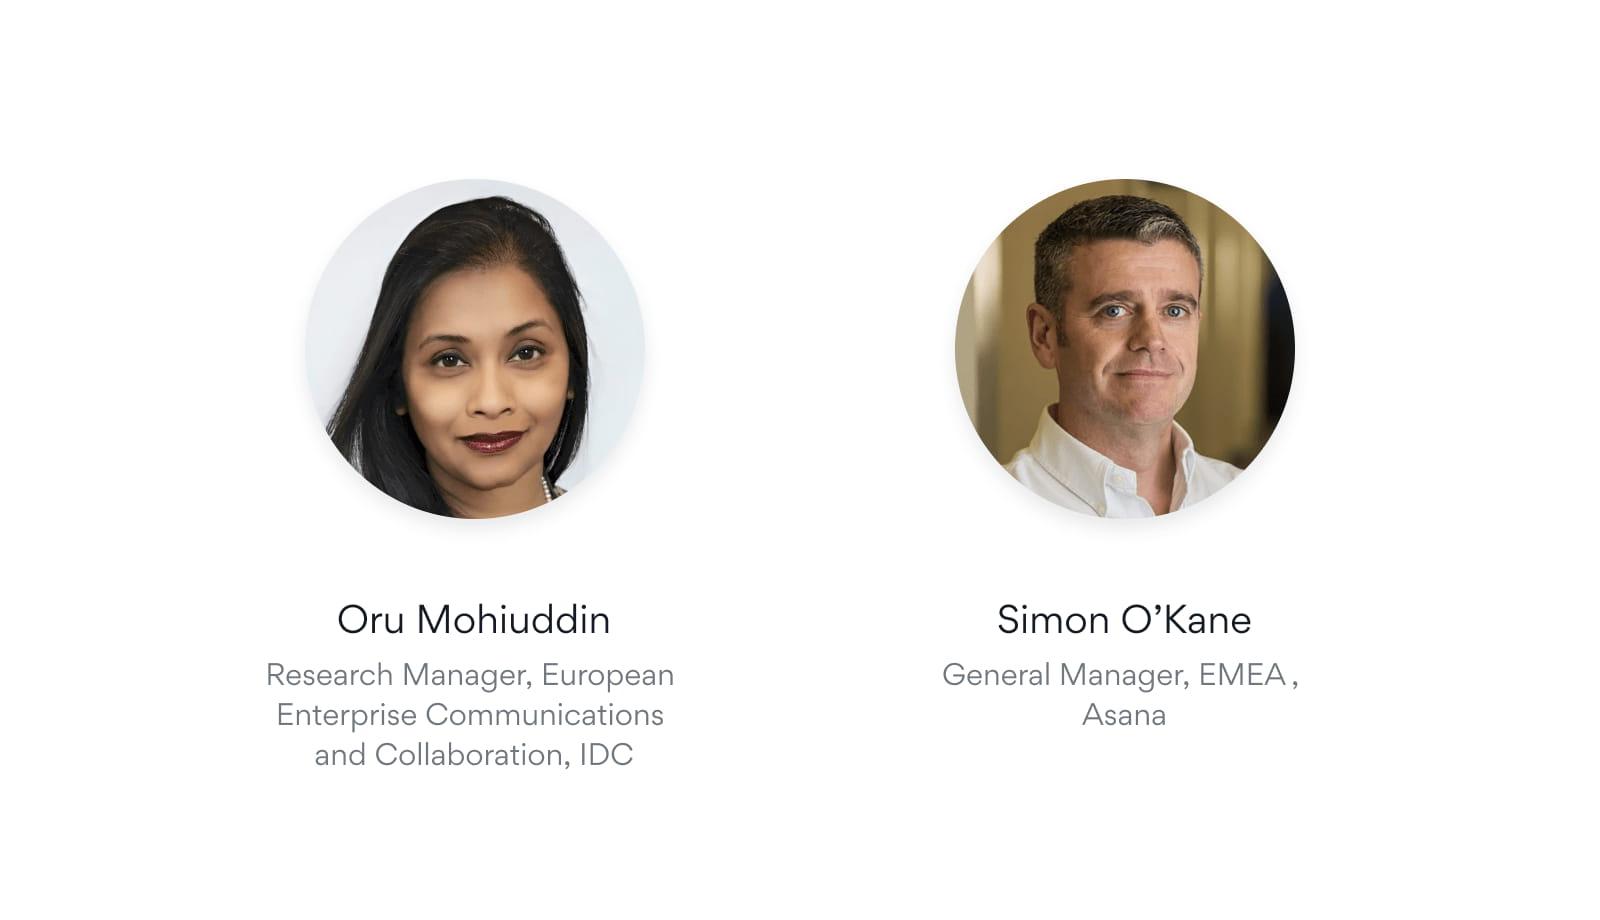 Collaboration and the new future of work with Oru Mohiuddin and Simon O'Kane